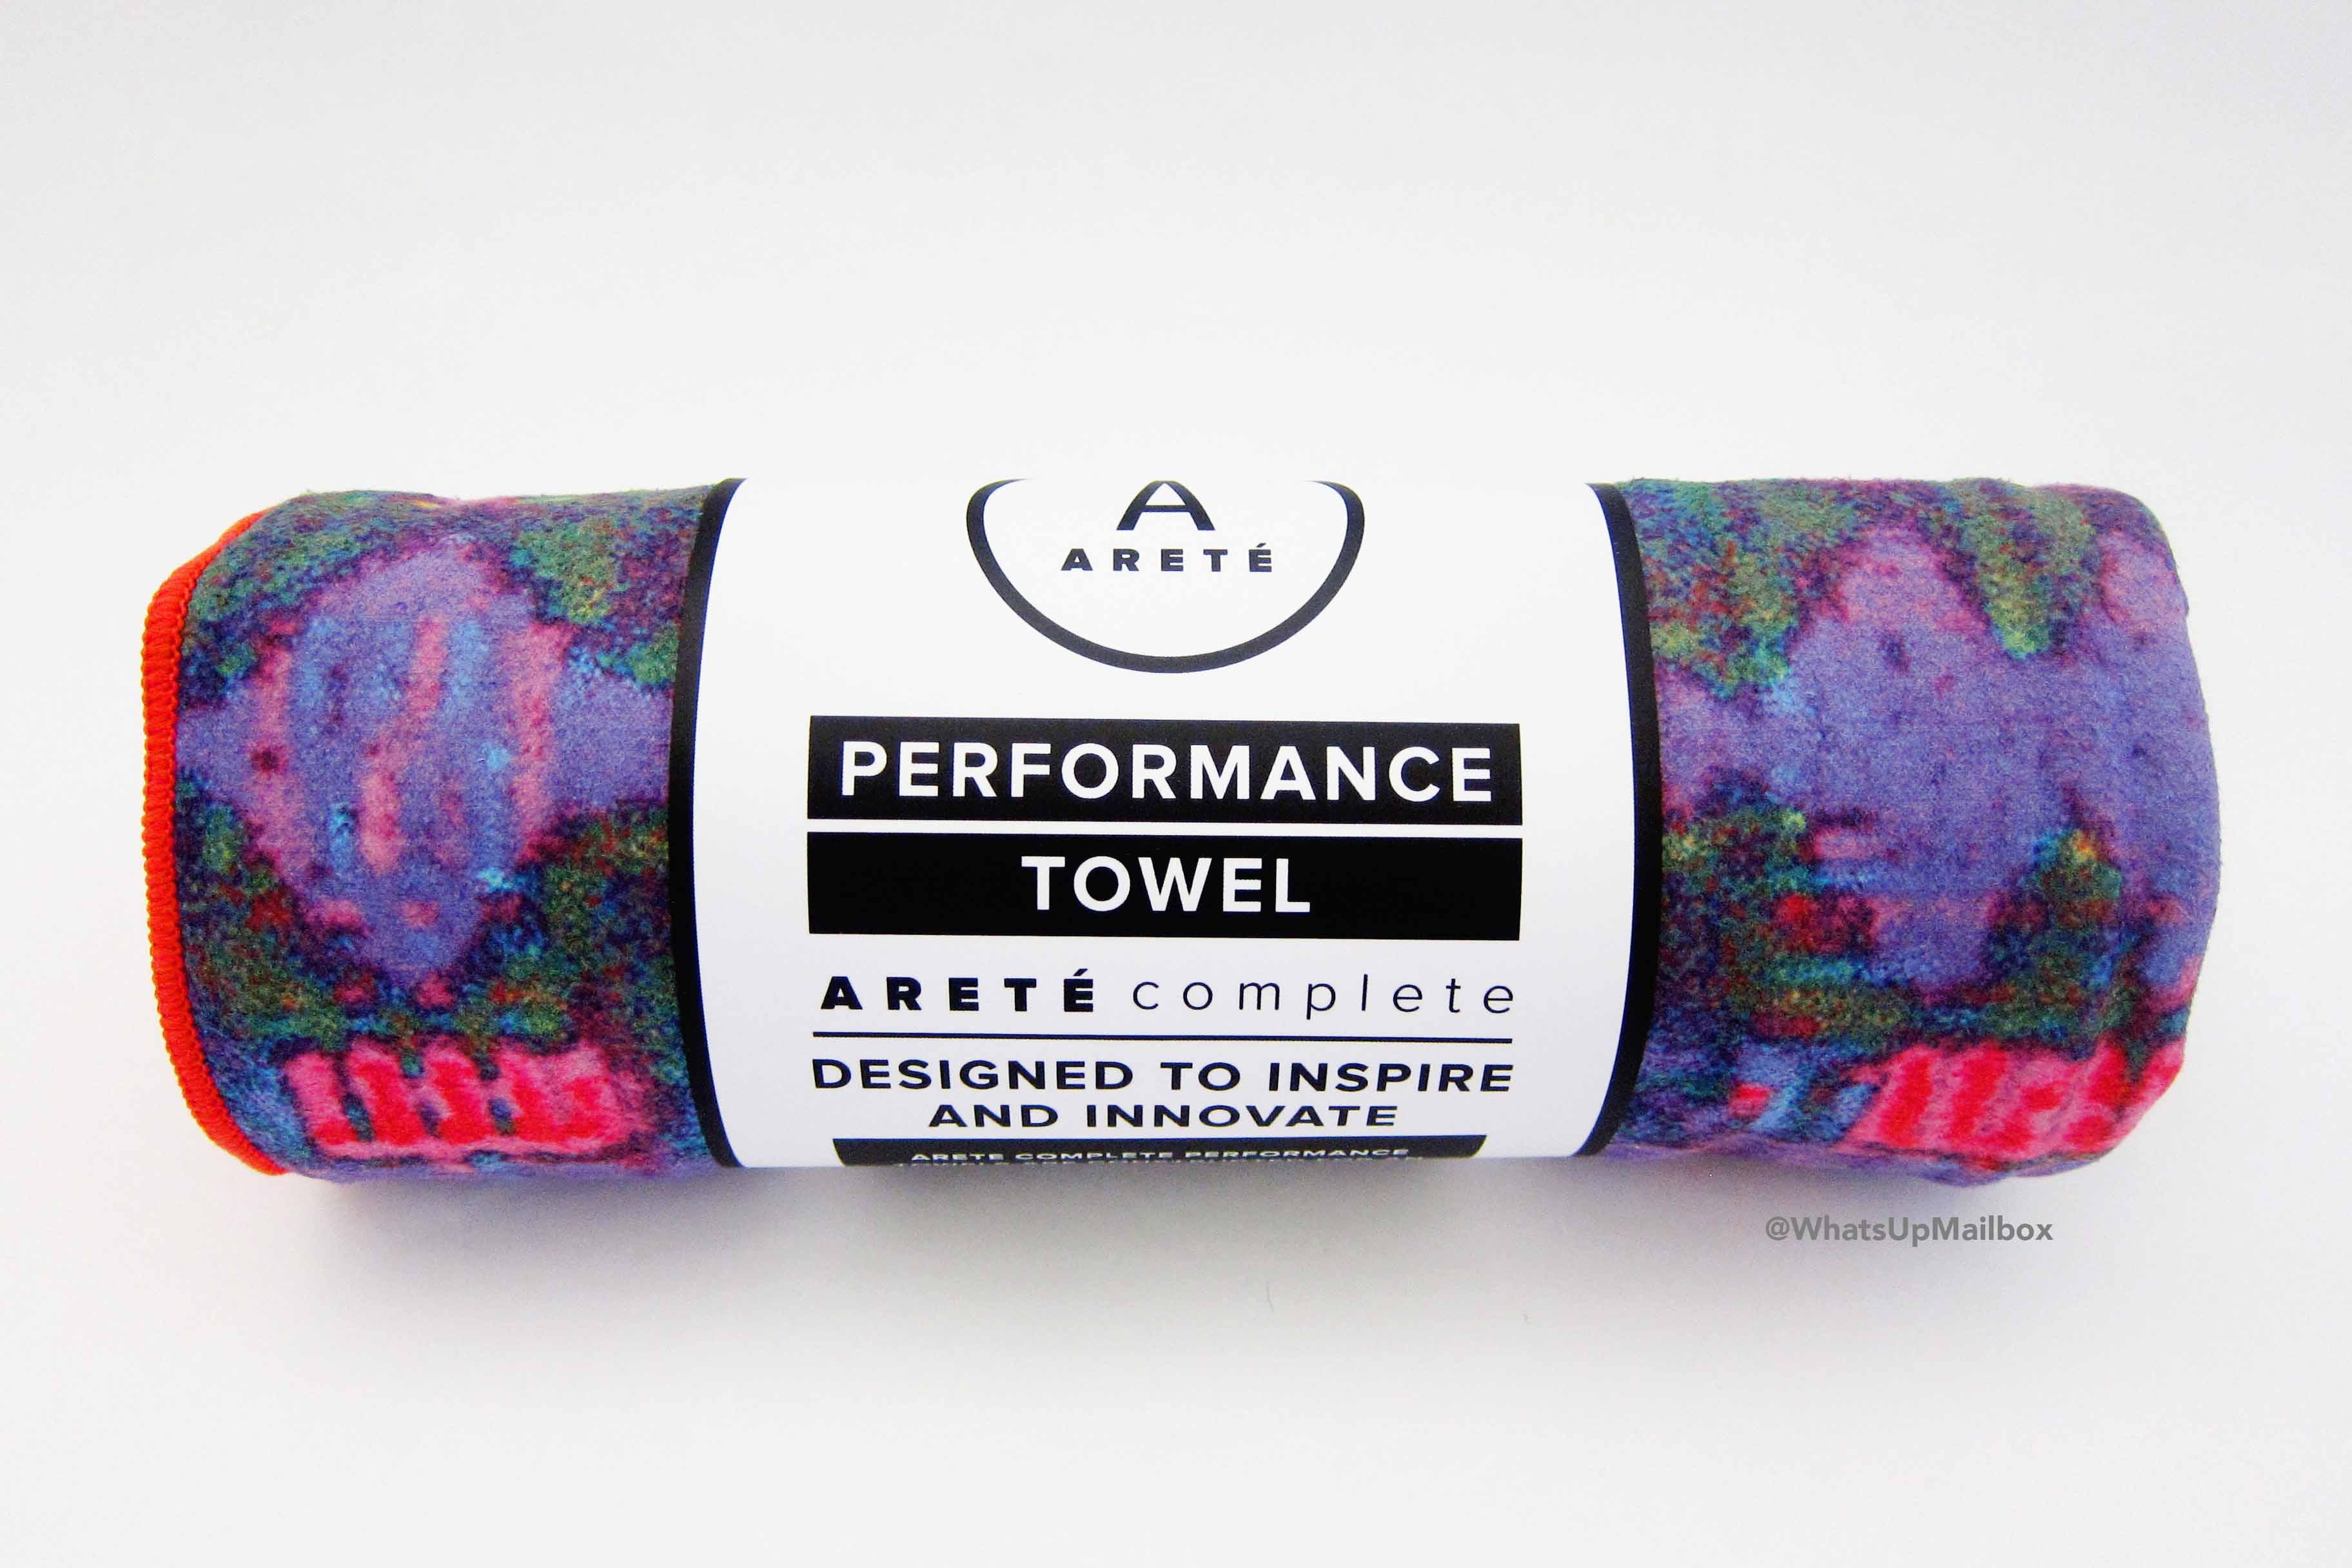 Arete Performance Towel